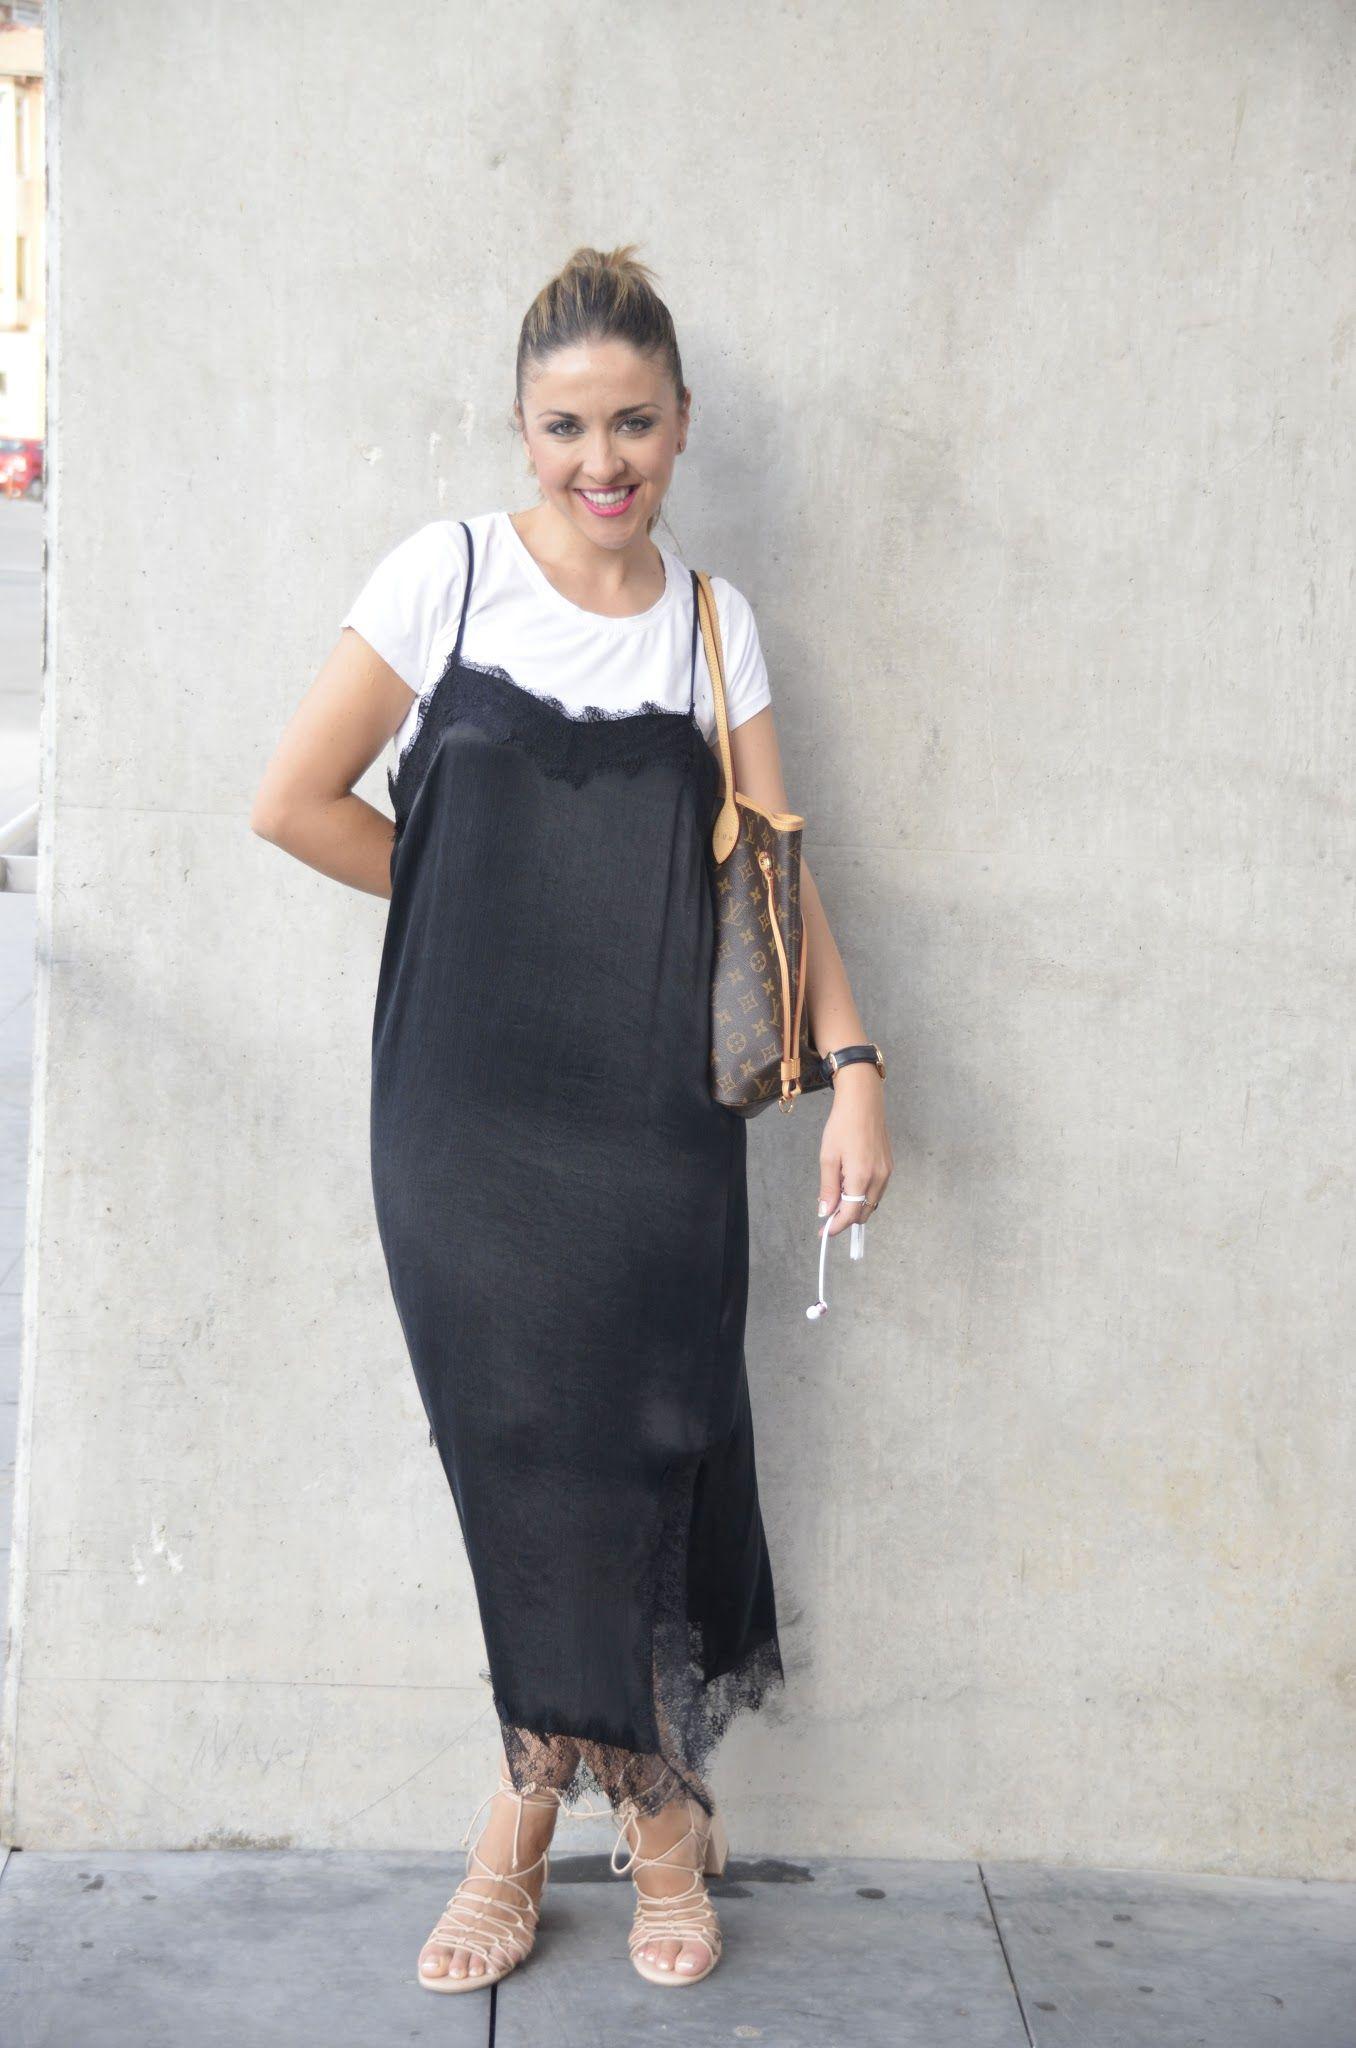 a57fb0a2a vestido lencero zara negro moda de los 90's   Tendencia vestido ...